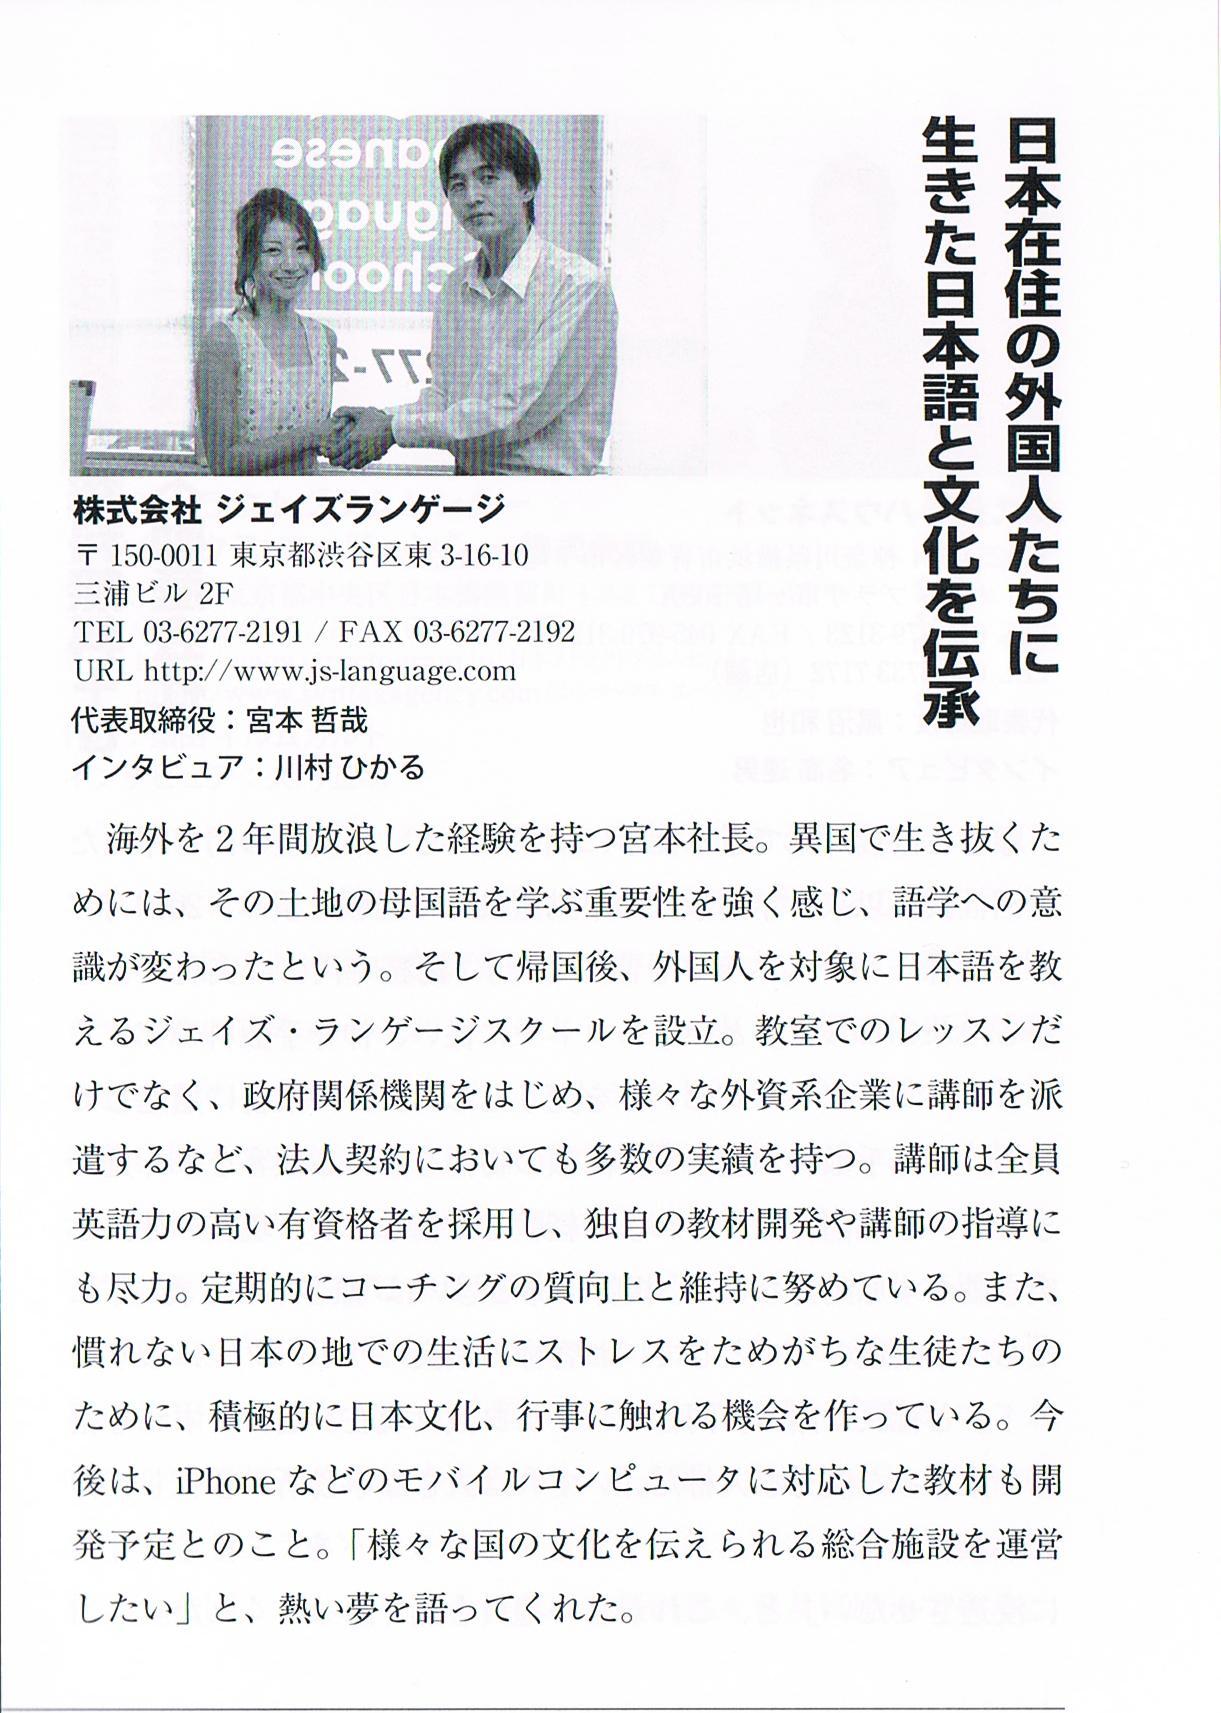 J's日本語学校 - インタビュー